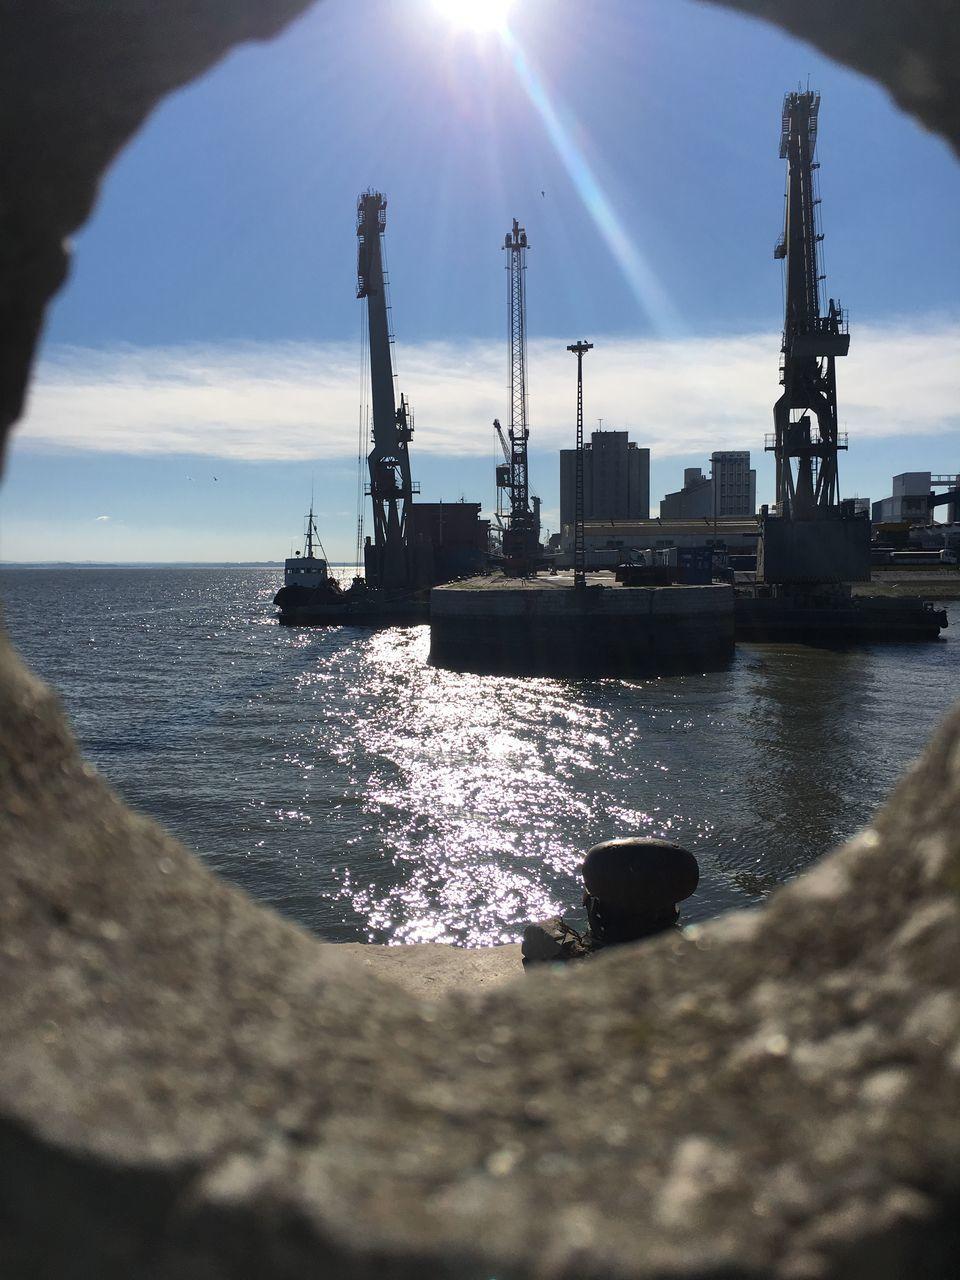 sunlight, industry, water, sky, sea, nautical vessel, sun, day, transportation, no people, outdoors, freight transportation, nature, shipyard